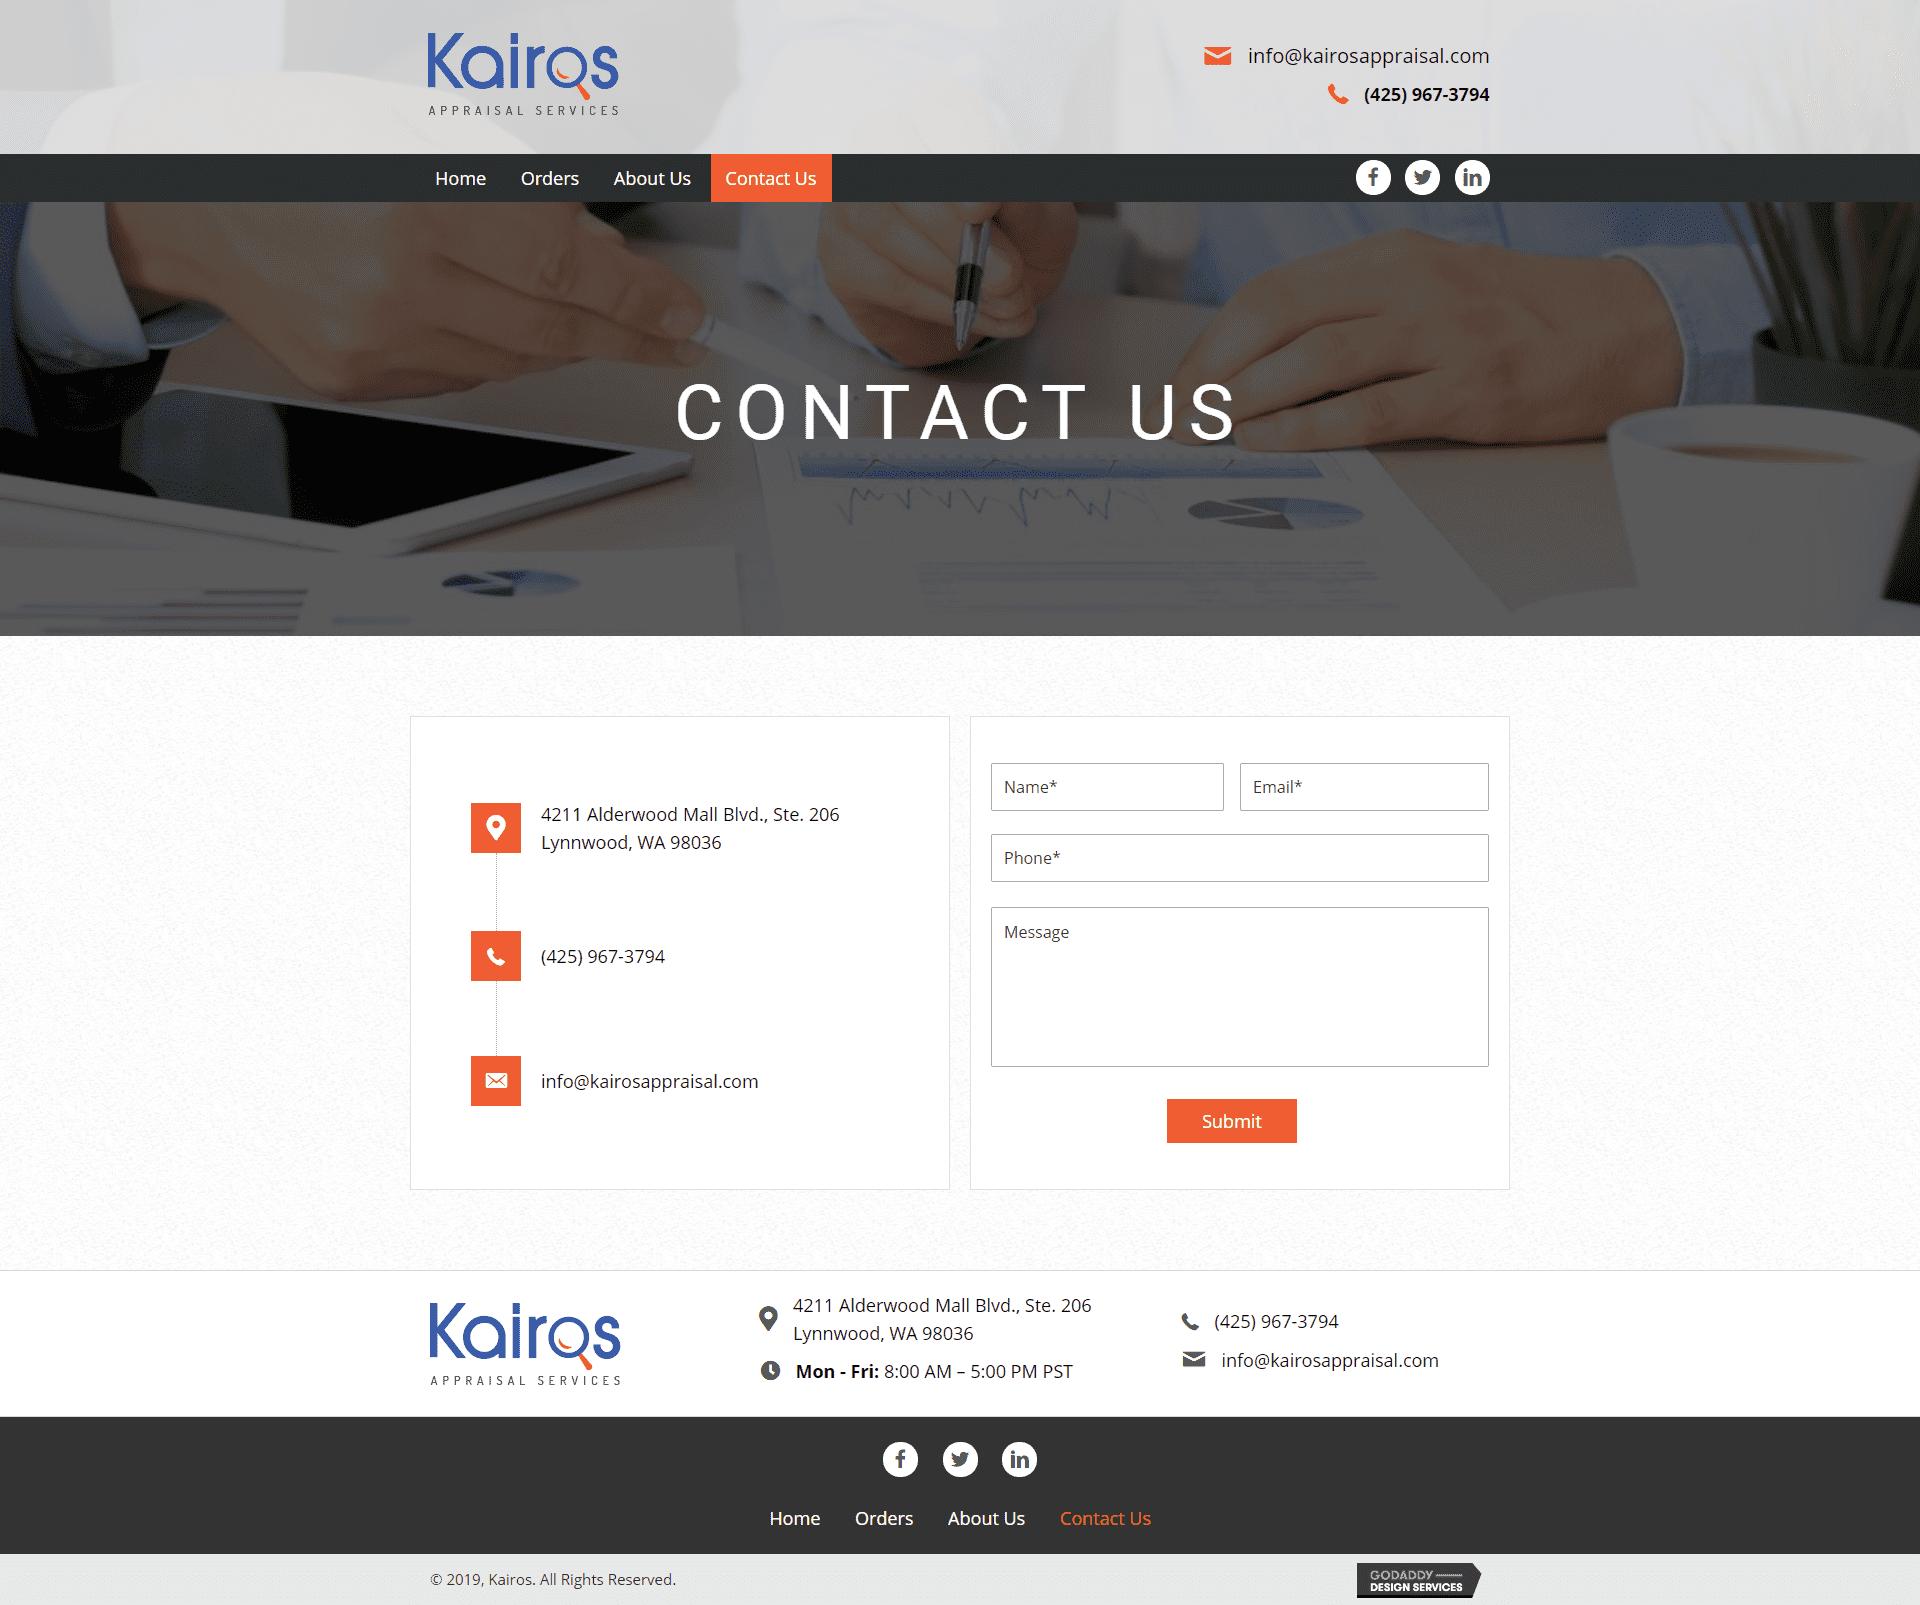 screencapture-kairosappraisal-contact-us